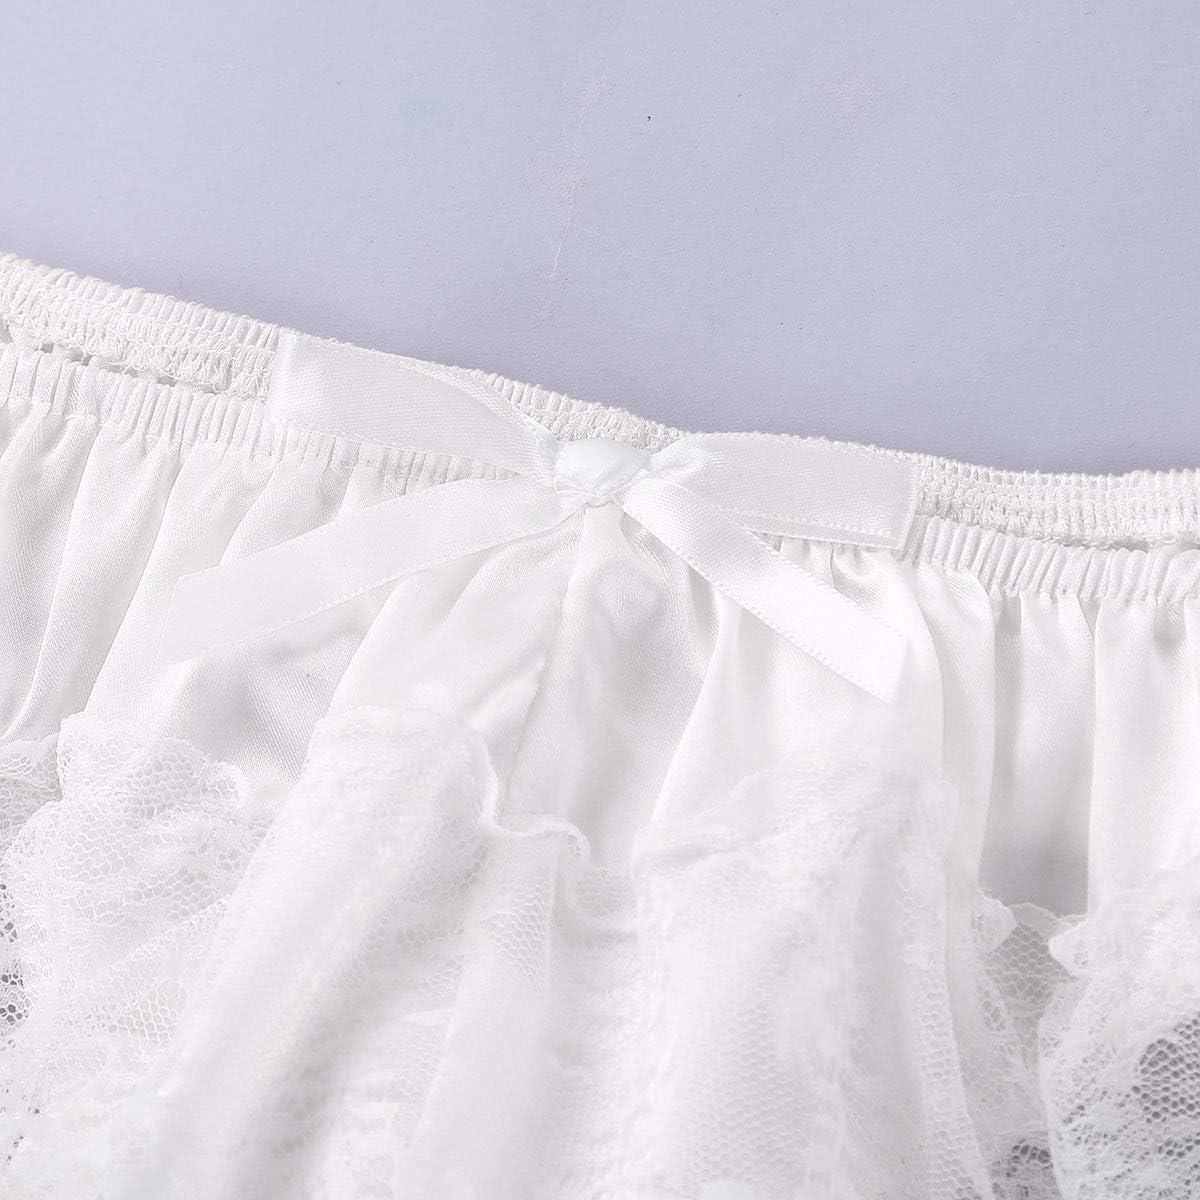 CHICTRY Homme String-Sexy sous-v/êtements Slip en Dentelle Transparent Taille Basse Homme Short de Bain Bikini Sissy-Lingerie-Erotique M-XL